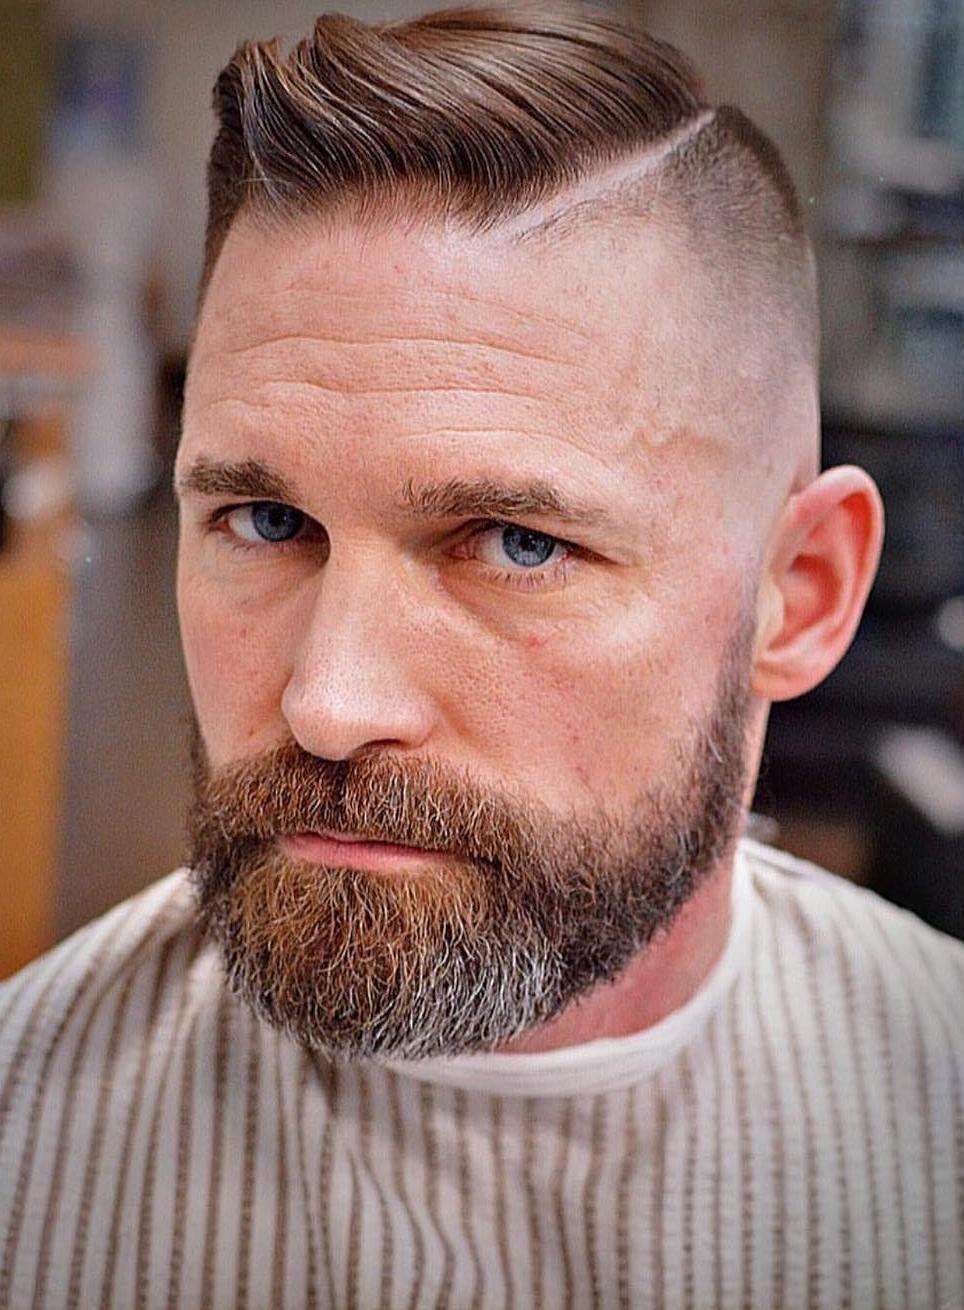 15 Amazing Balding Men Hairstyles For Hair Makeover Mens Haircuts For Balding Men Balding Mens Hairstyles Thin Hair Men